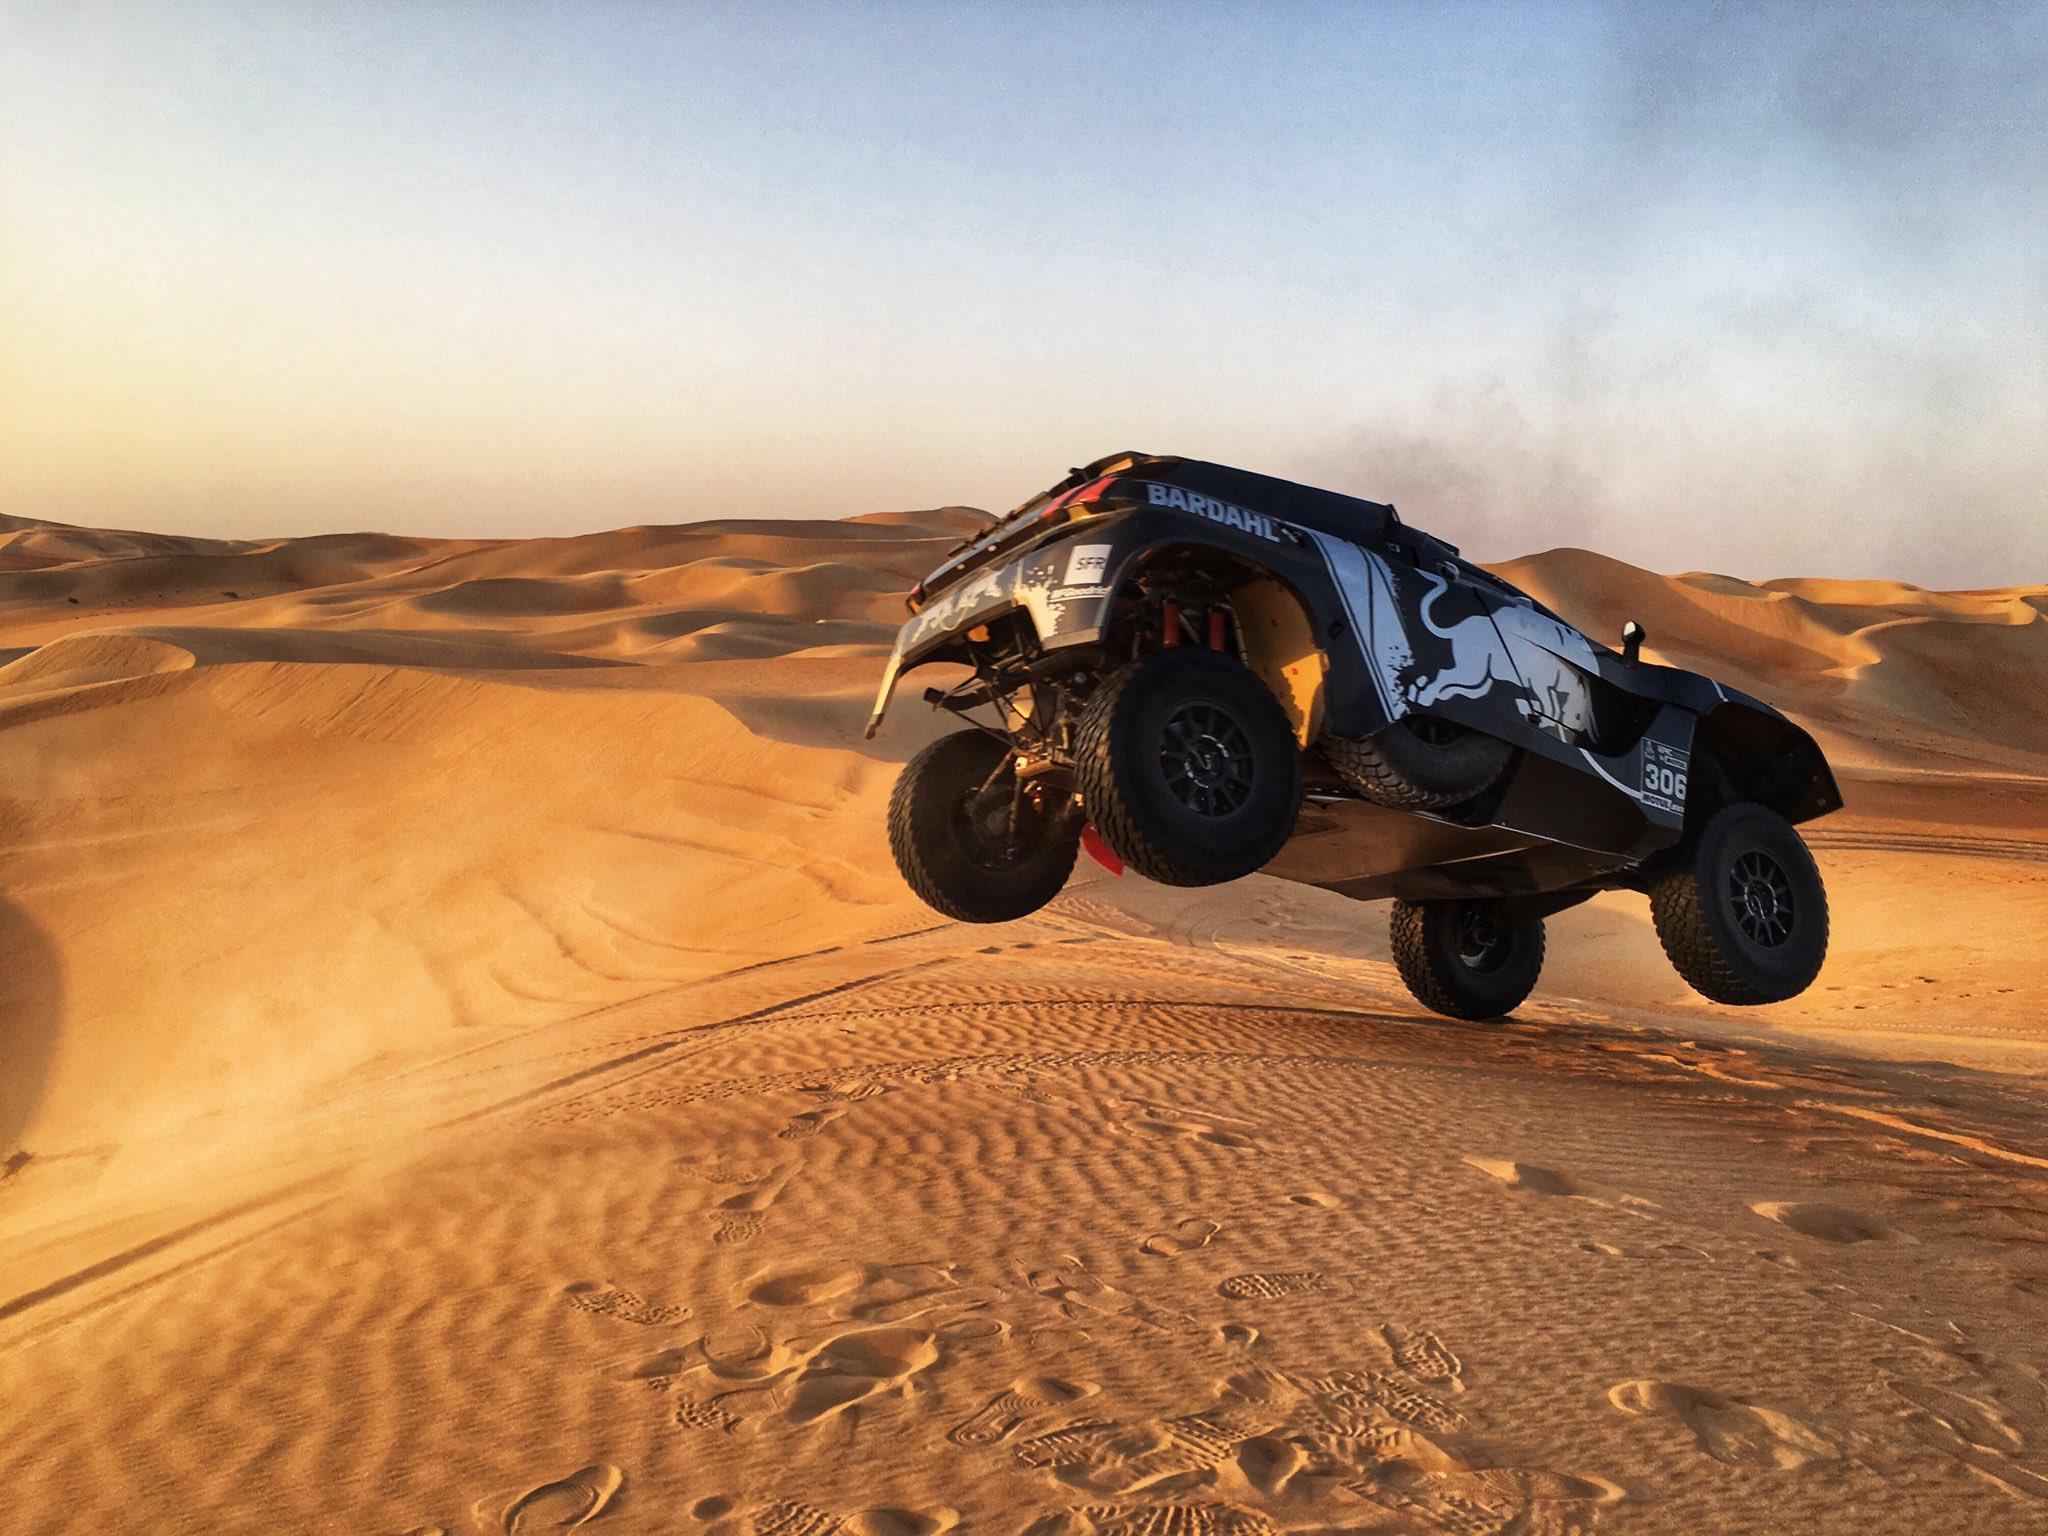 2019 41º Rallye Raid Dakar - Perú [6-17 Enero] - Página 2 DuJfUr5XQAIlMZ1